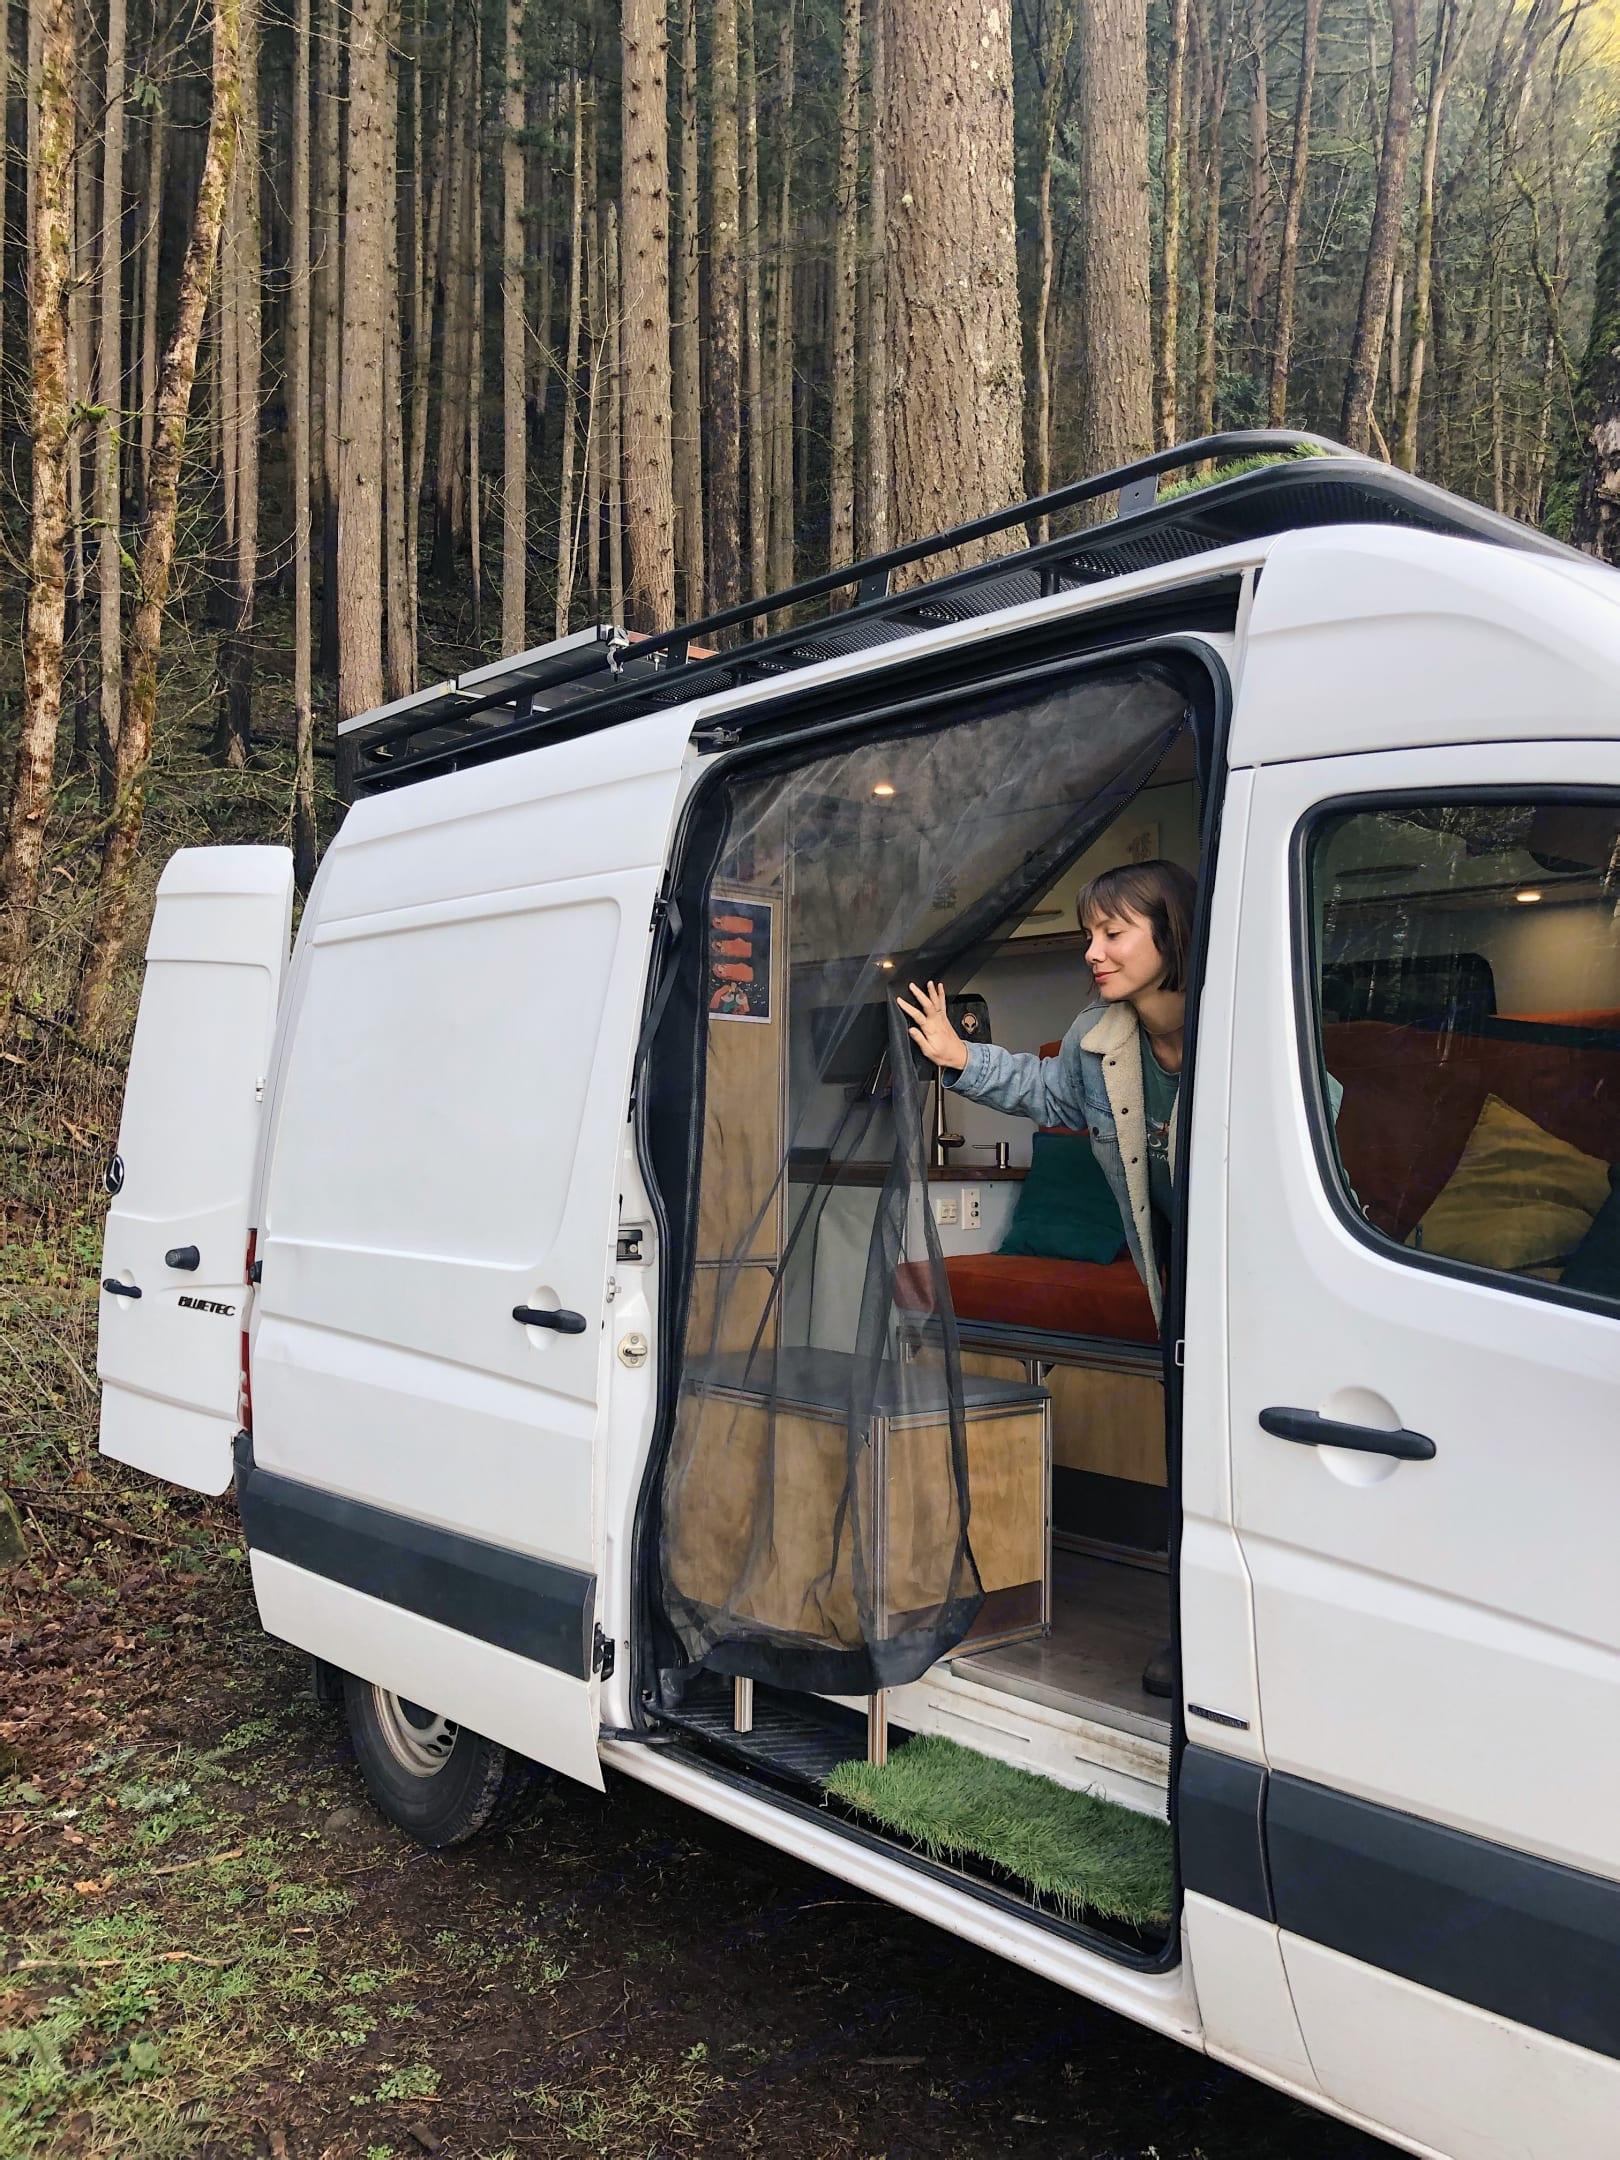 Bug netting keeps the interior free of pesky bugs. . Mercedes-Benz Sprinter 2012